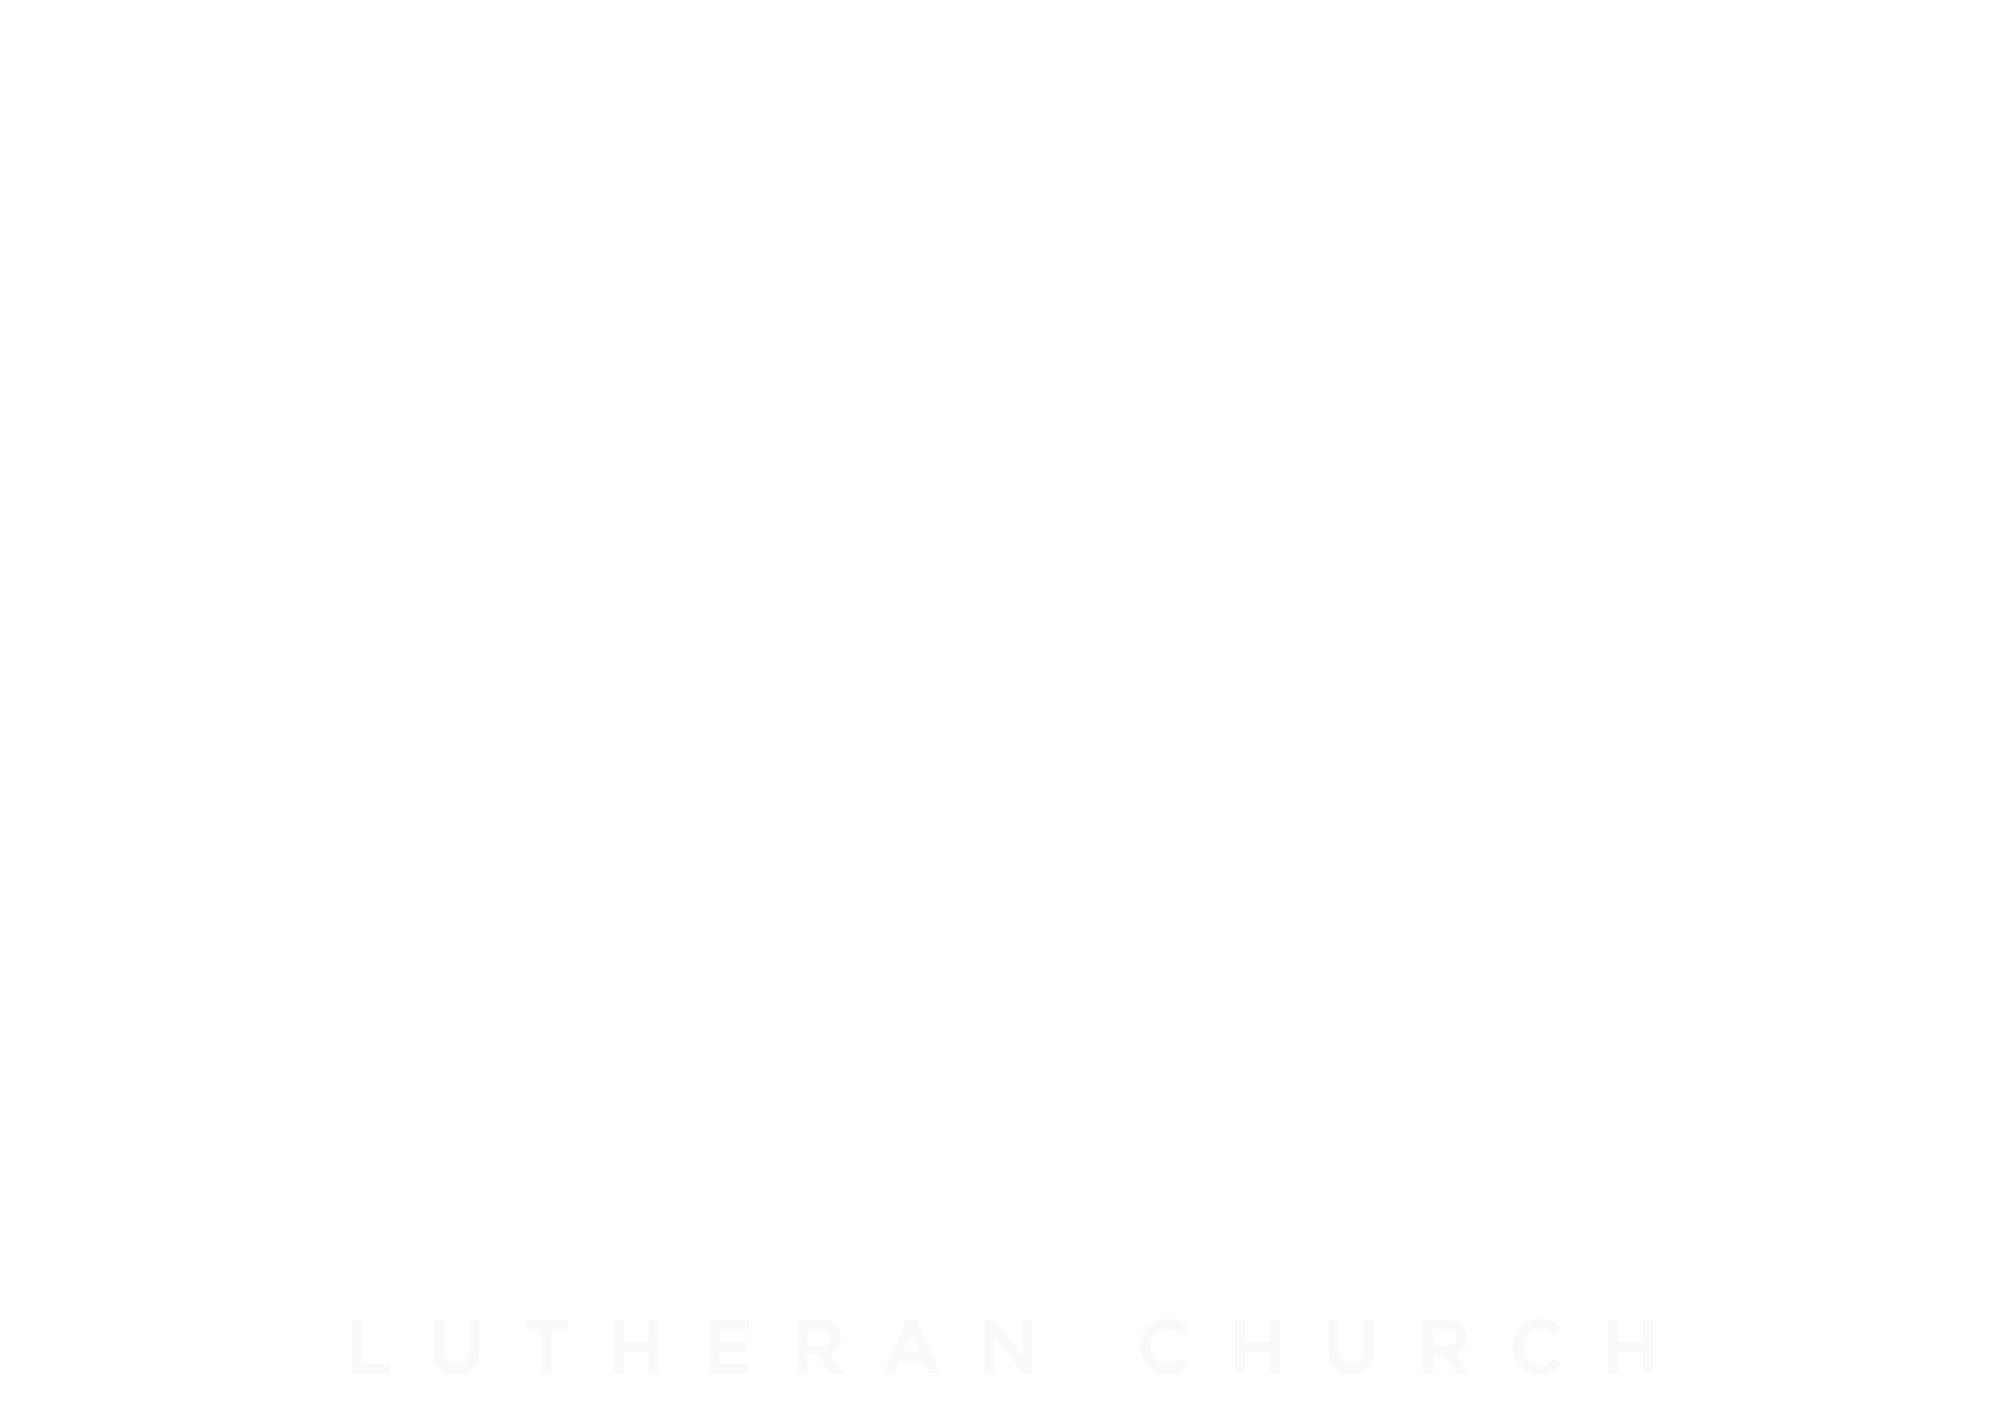 Danebod Lutheran Church